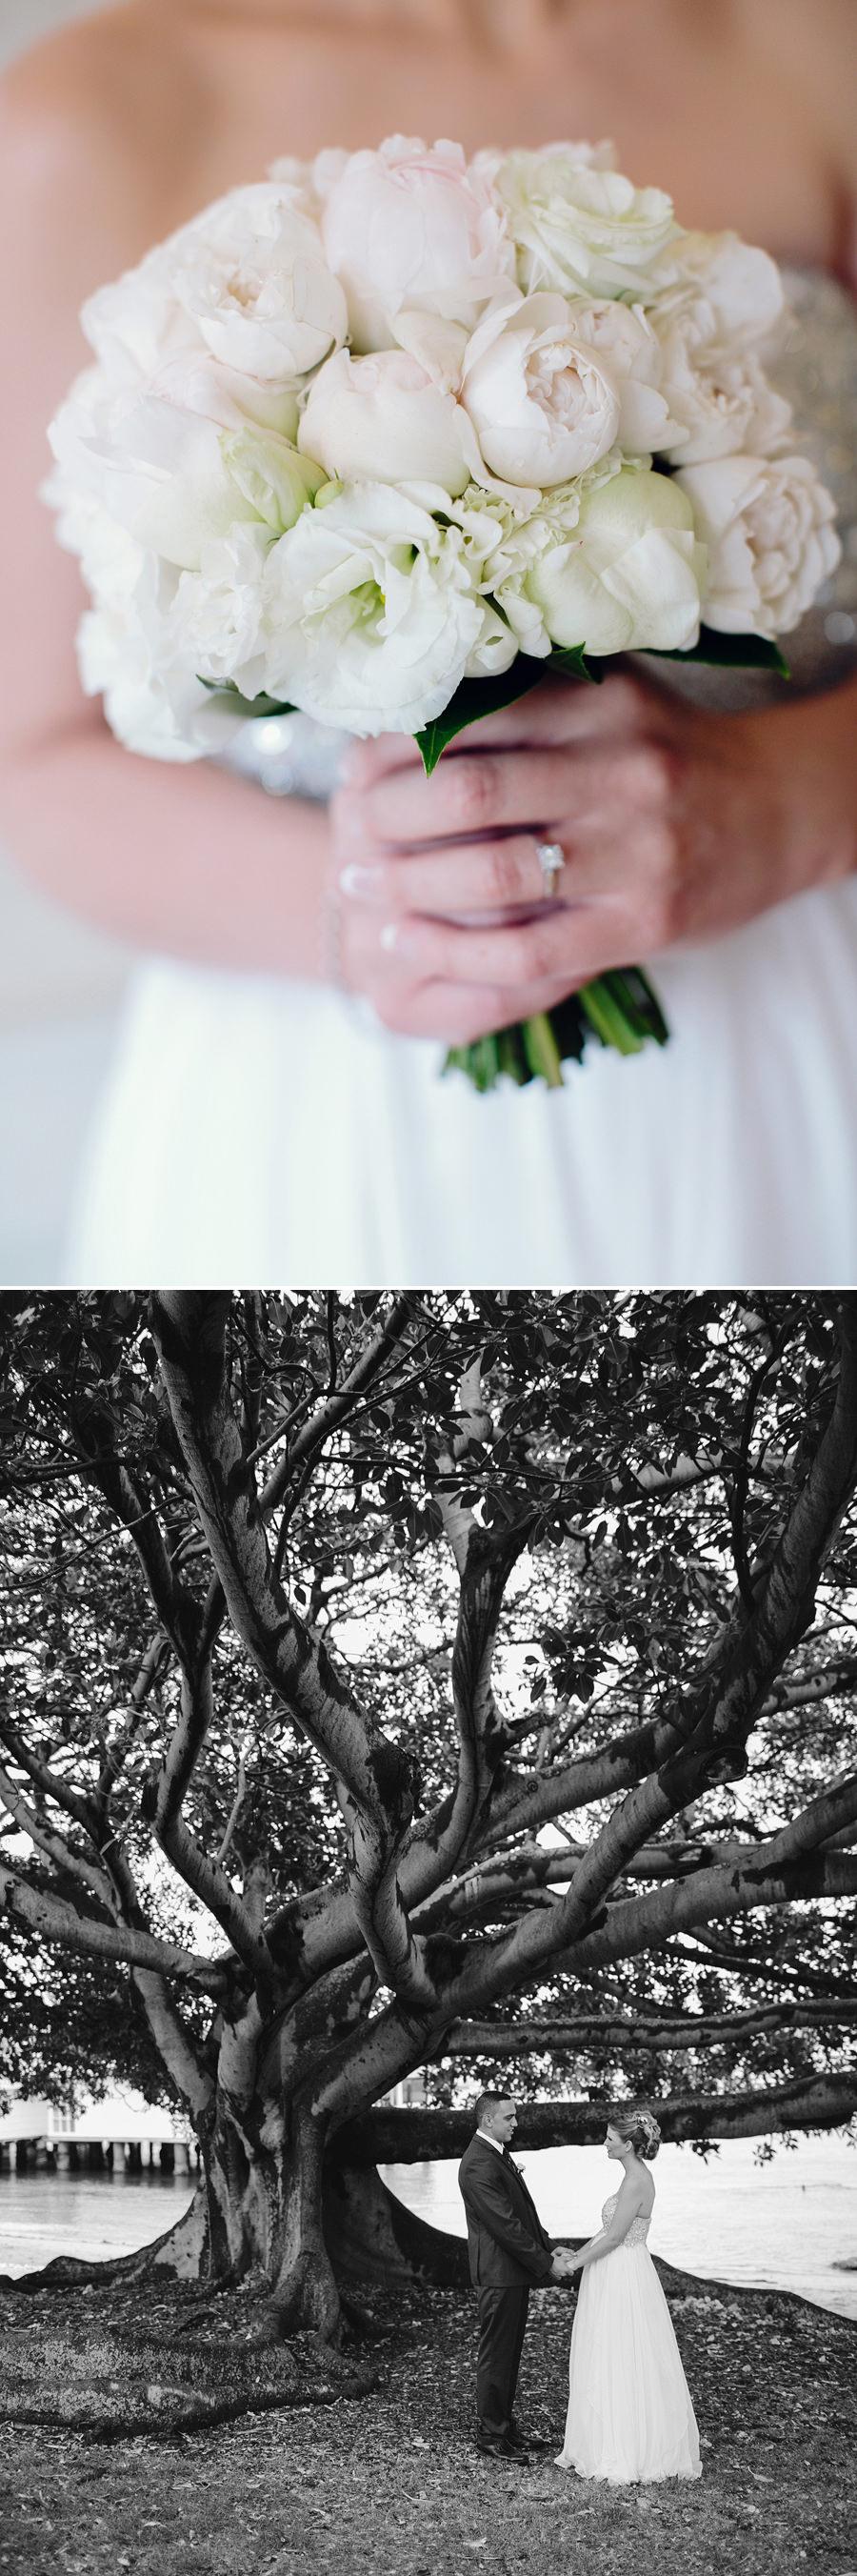 Elegant Wedding Photographer: Bride & Groom Portraits